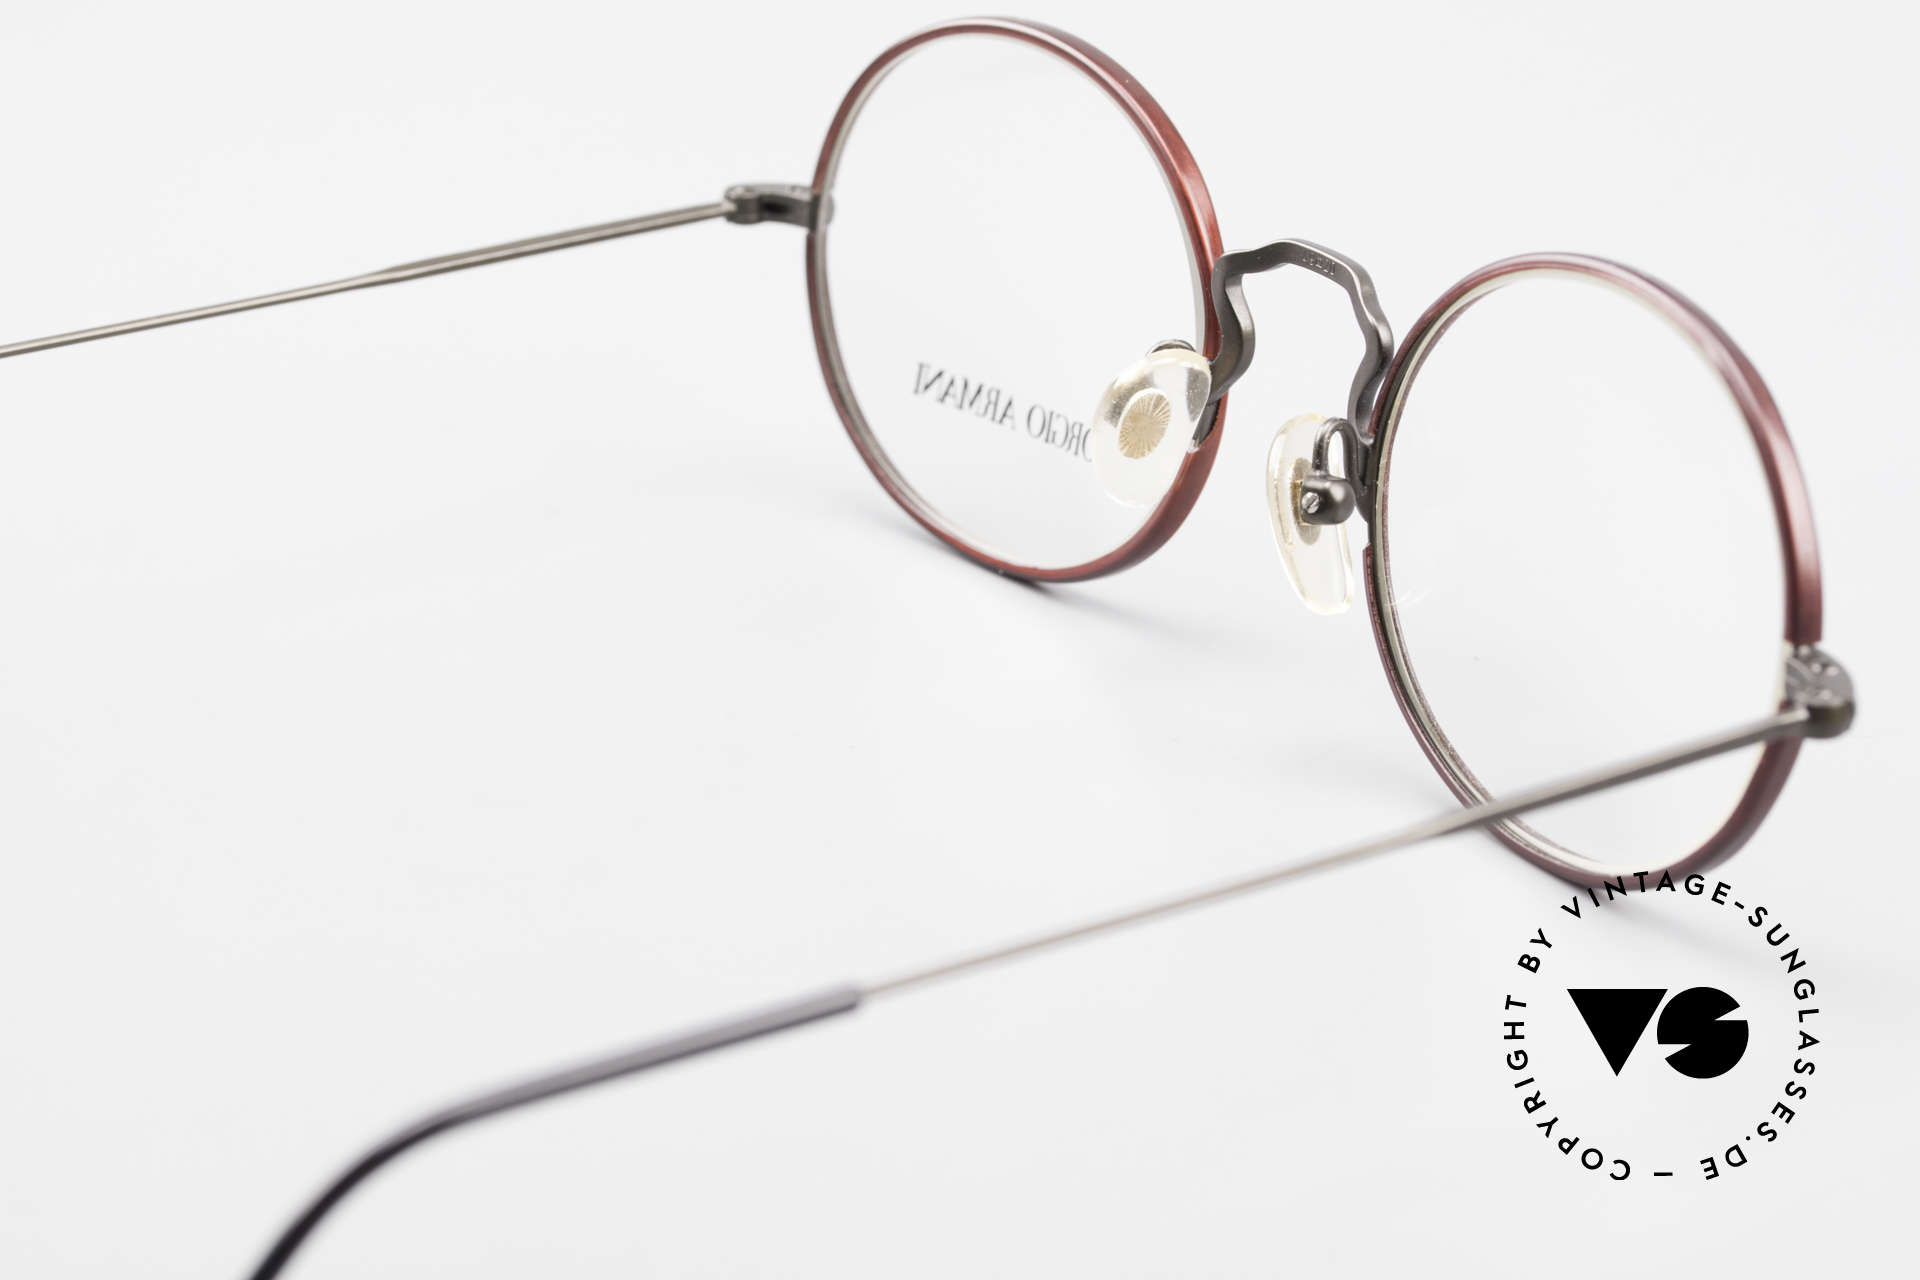 Giorgio Armani 247 Oval 90's Eyeglasses No Retro, frame can be glazed with optical lenses / sun lenses, Made for Men and Women